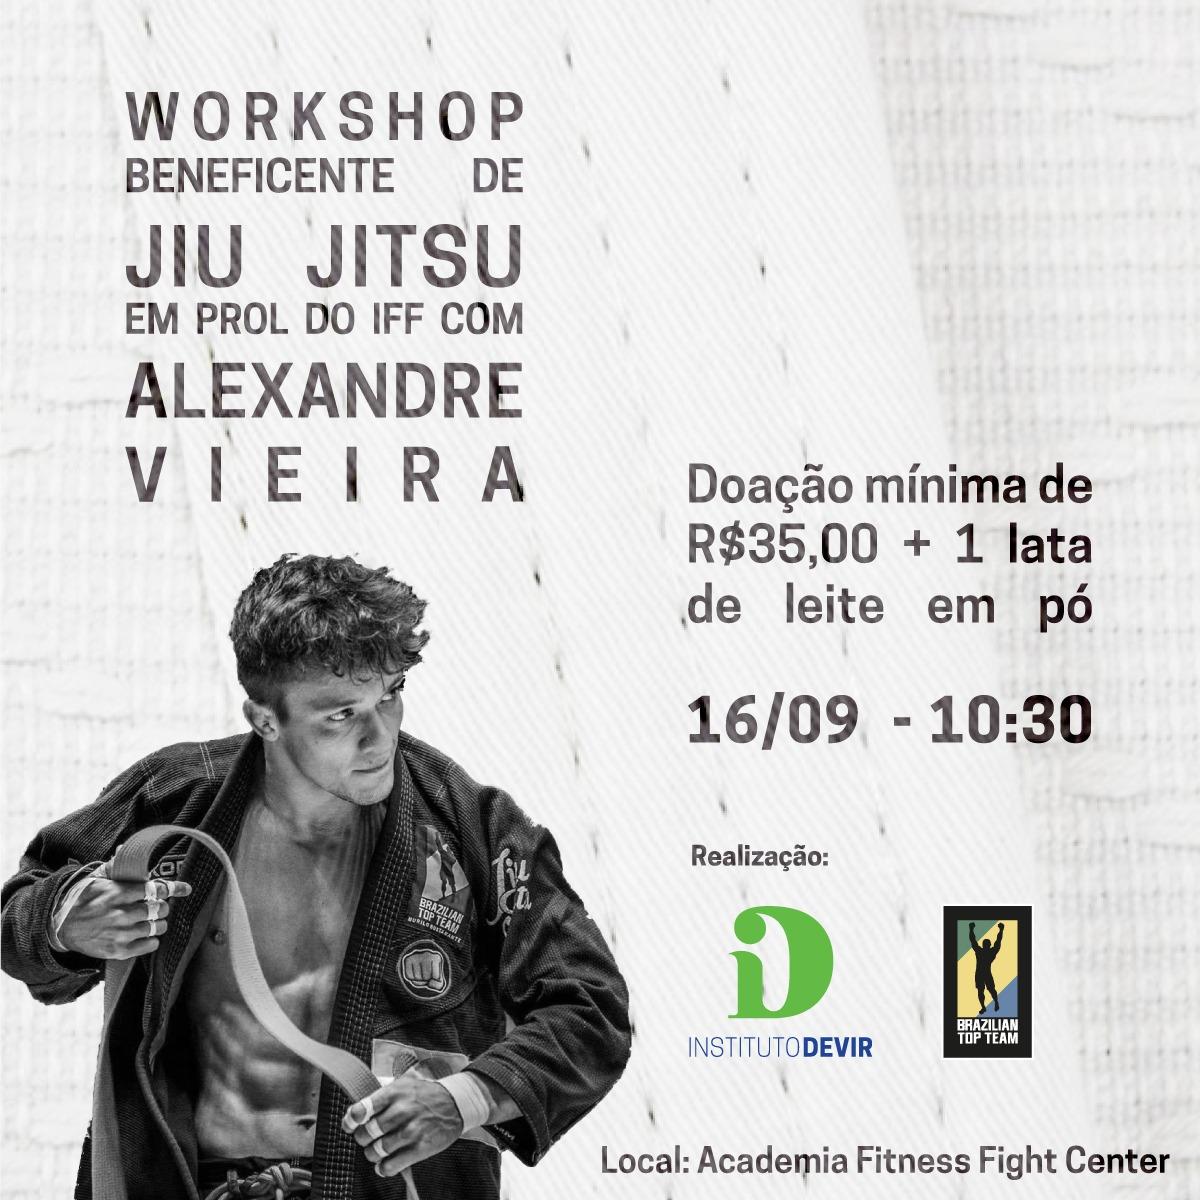 Workshop beneficente de Jiu-Jitsu arrecada fundos para o Instituto Fernandes Figueira (IFF)